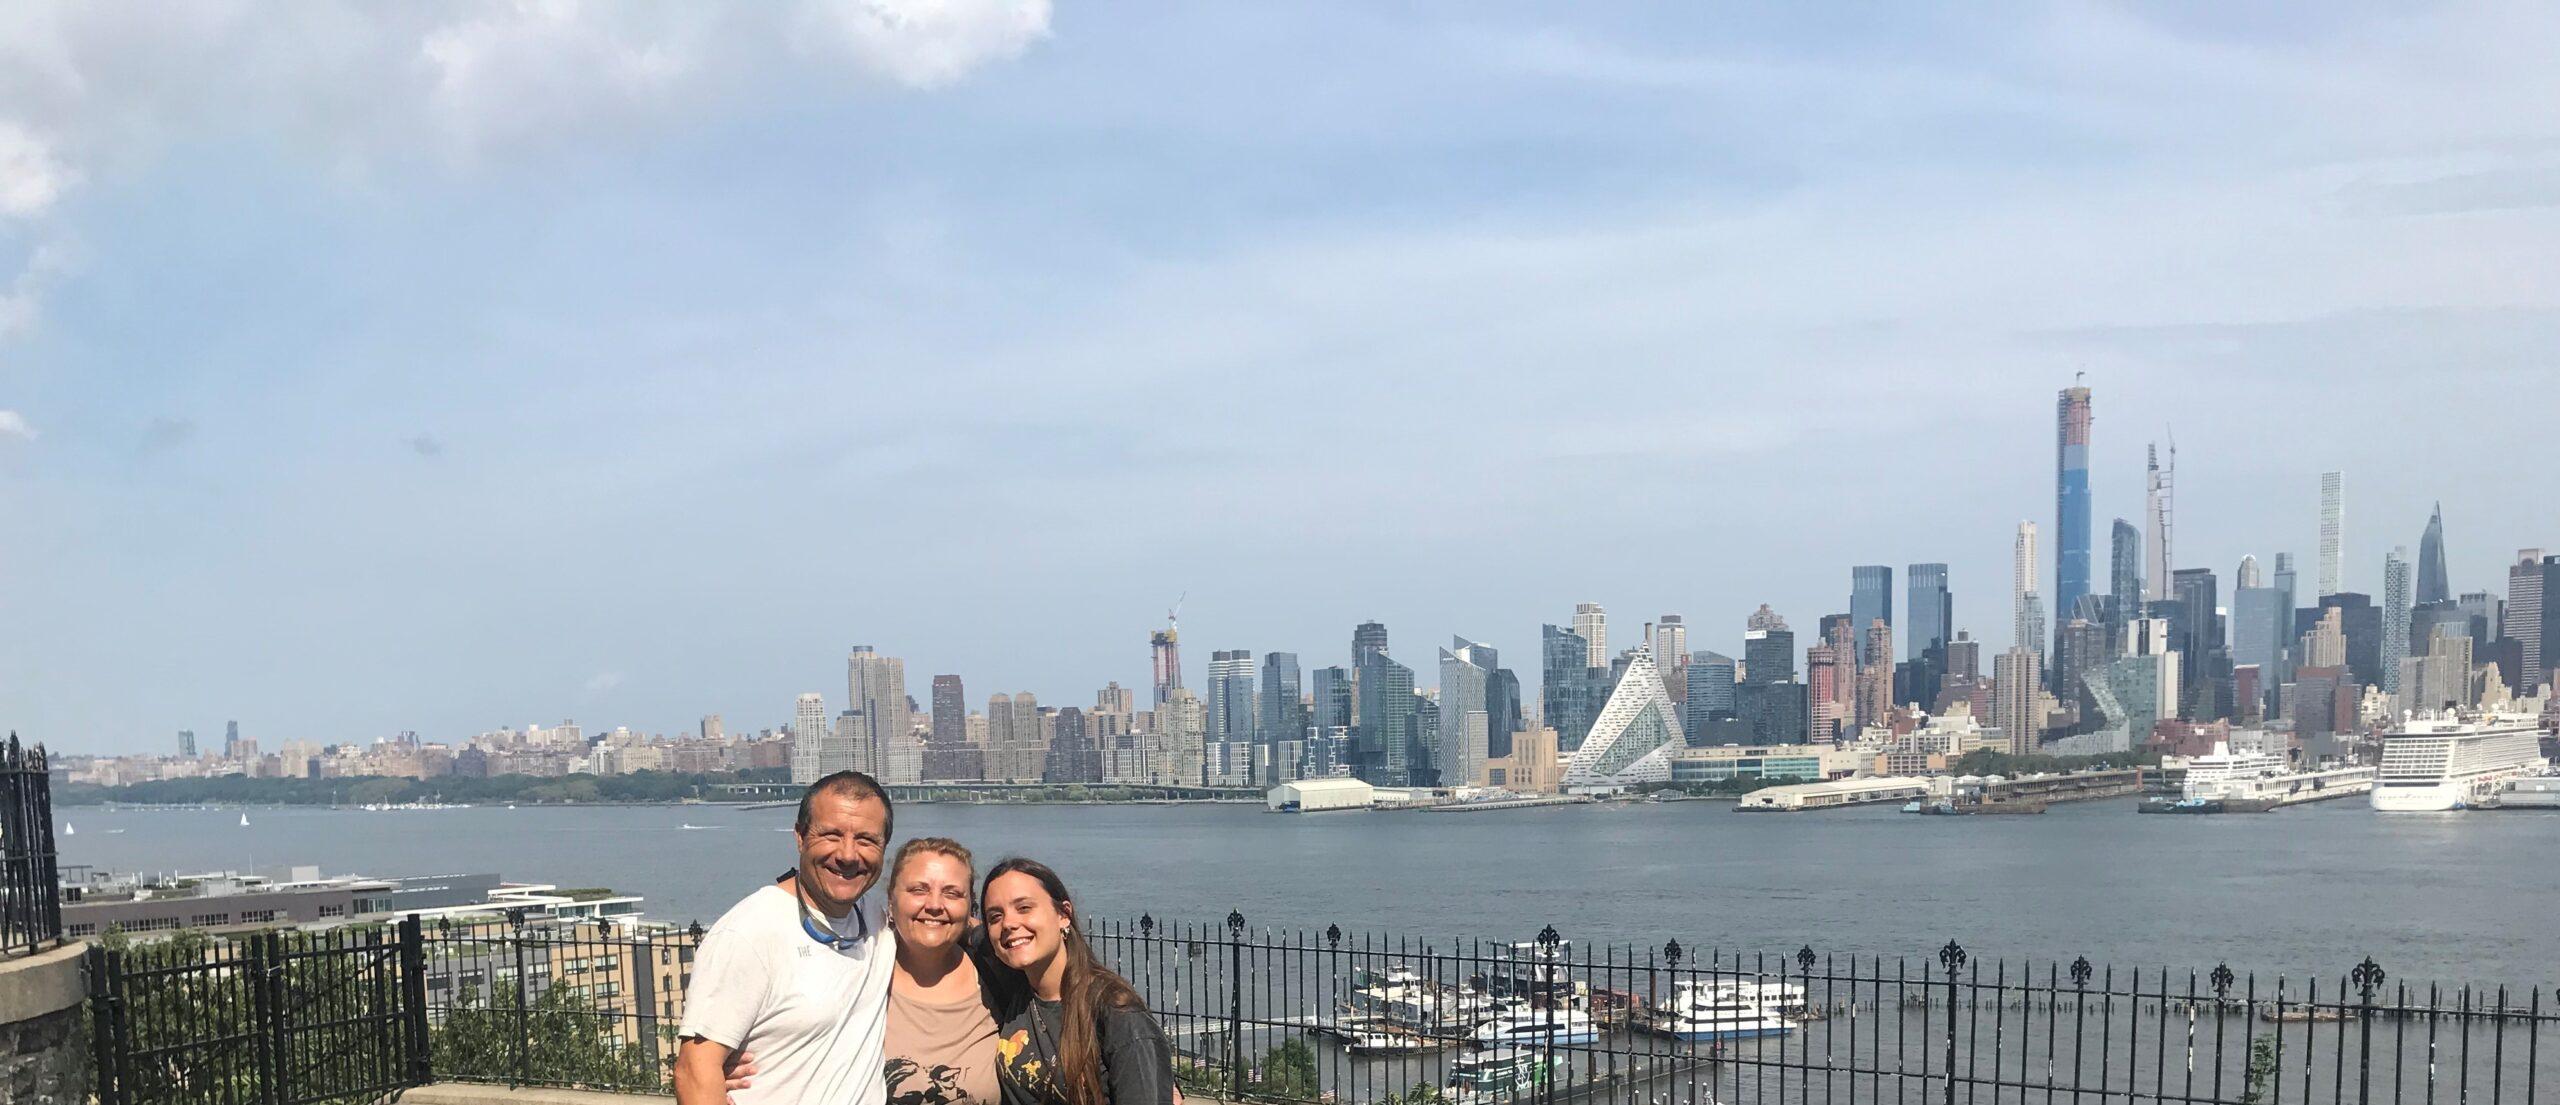 NUEVA YORKma scaled